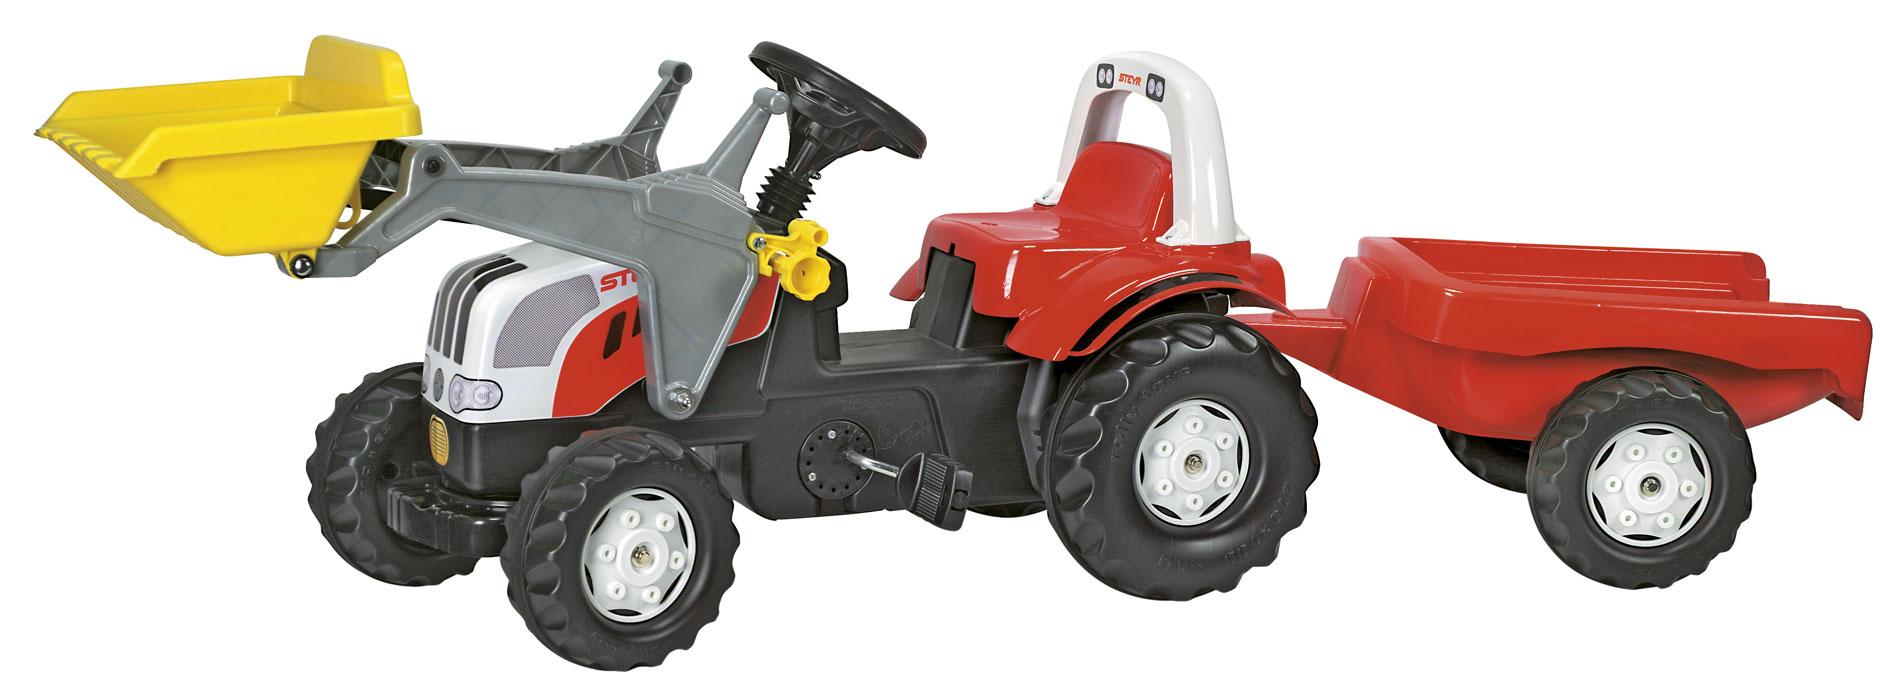 ROLLY TOYS 023936 Šlapací traktor rollyKid Steyr CVT 6190 s nakladačem a vlekem